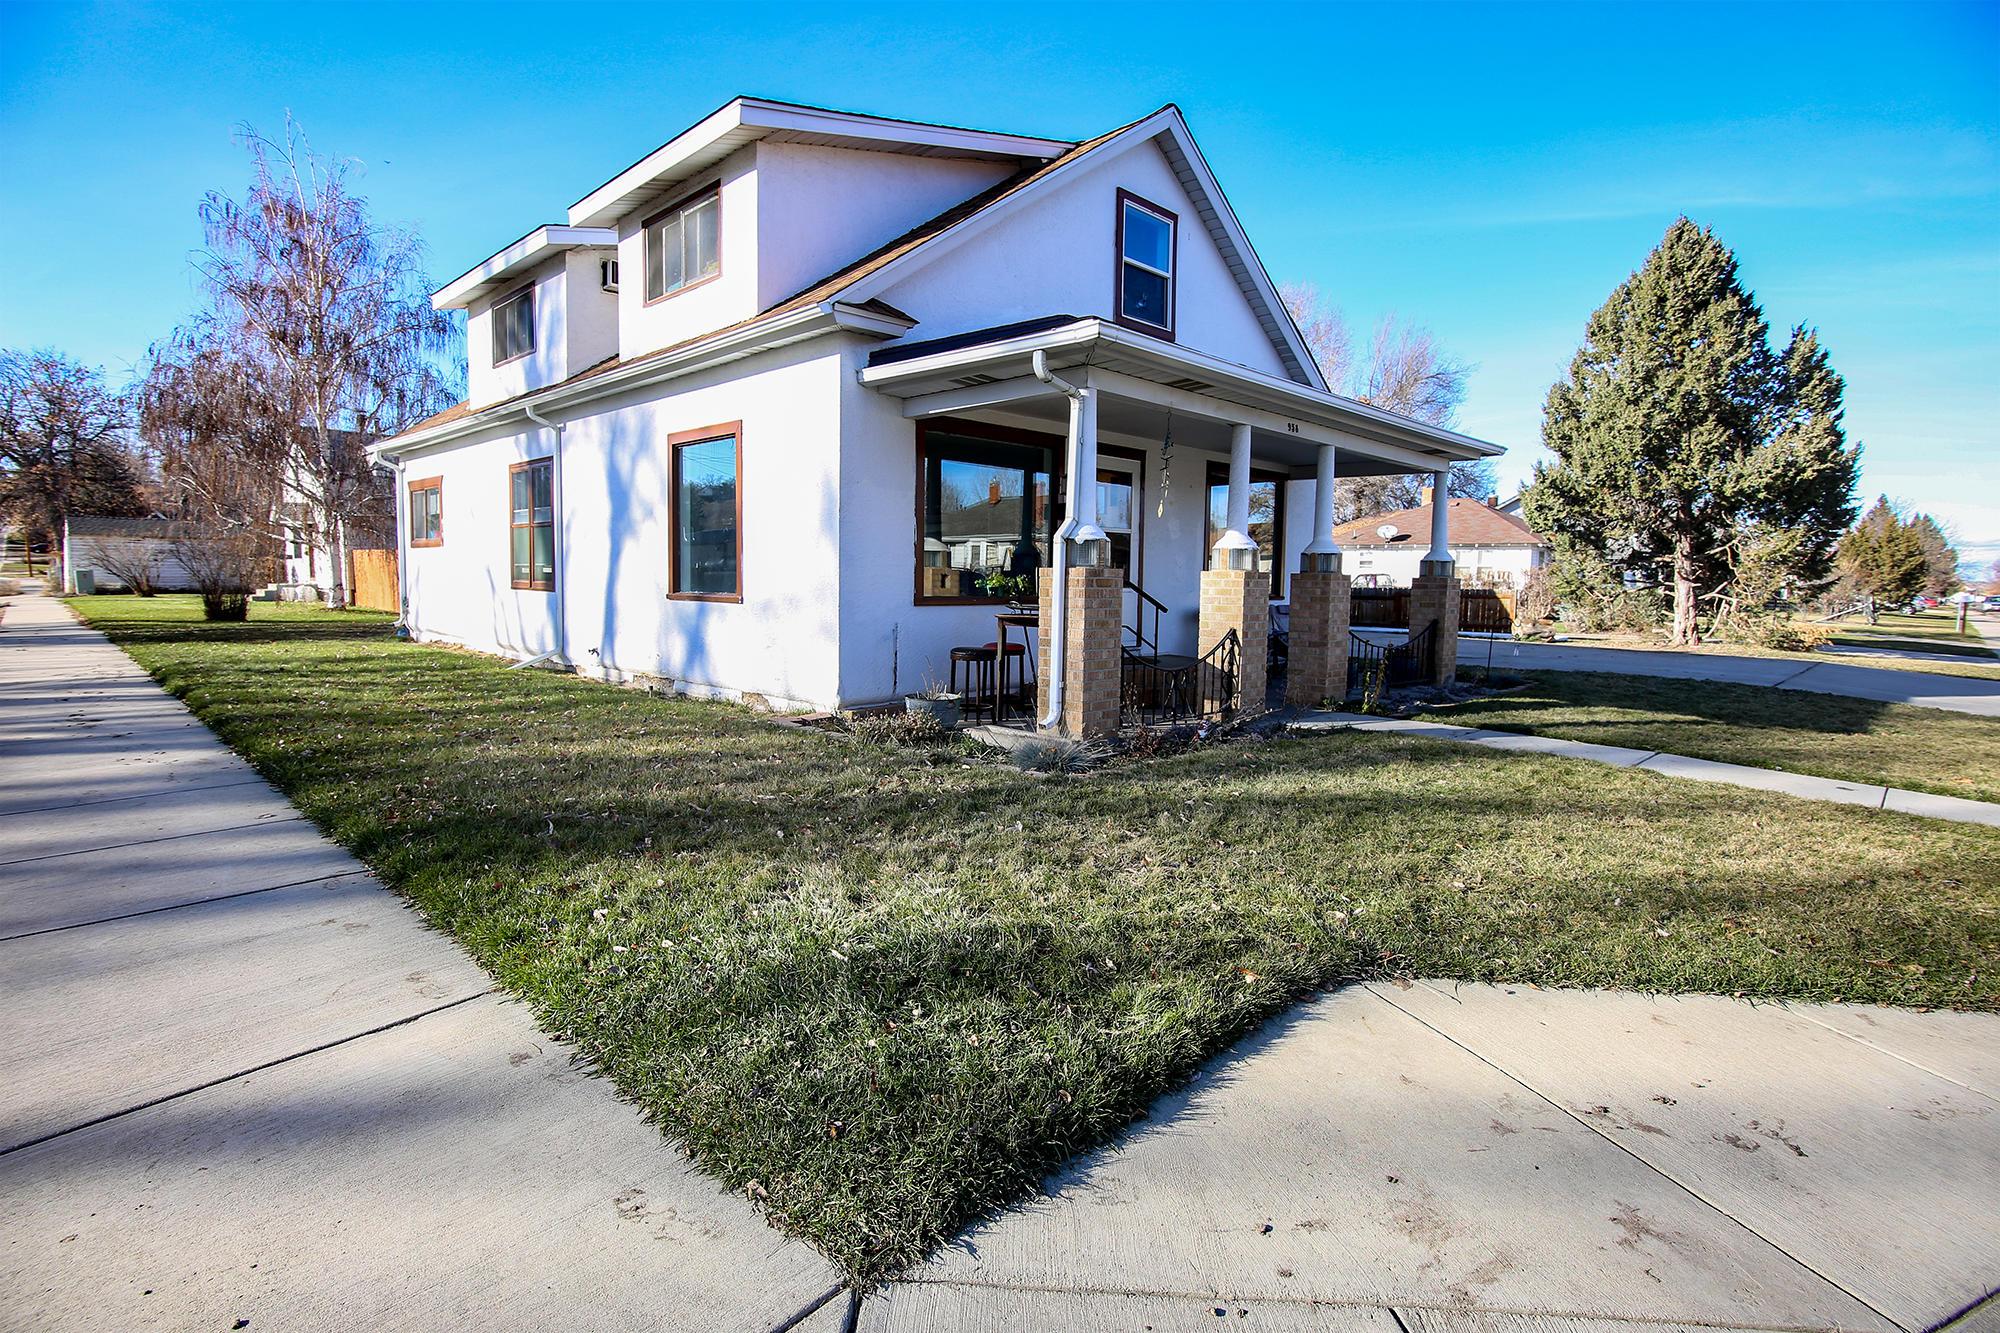 958 Sumner Street, Sheridan, Wyoming 82801, 5 Bedrooms Bedrooms, ,2 BathroomsBathrooms,Residential,For Sale,Sumner,18-1206